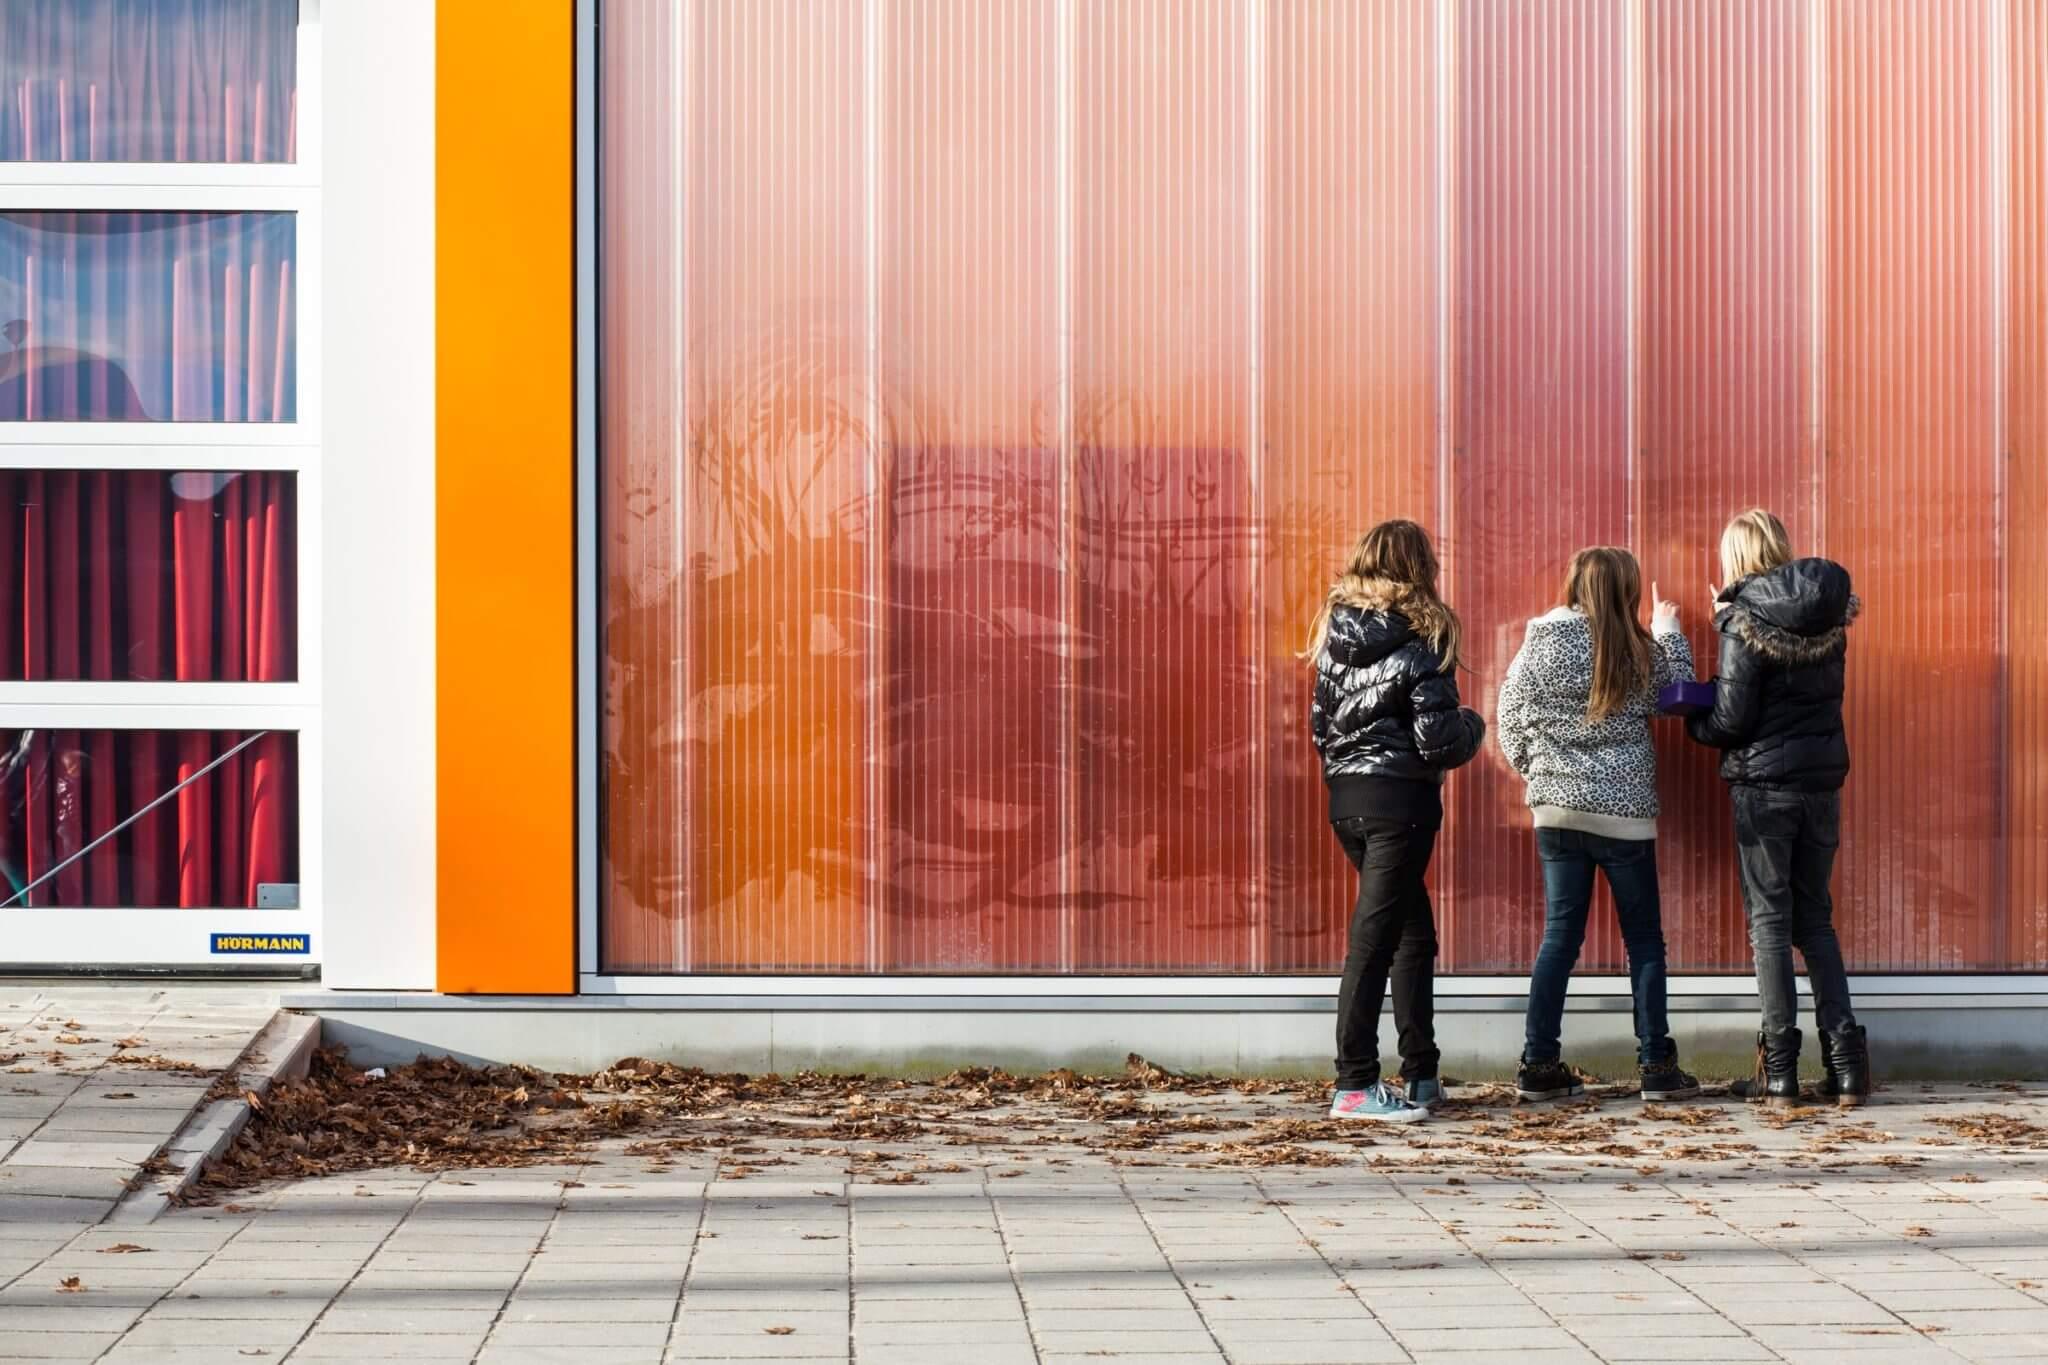 Rodeca Mierlo hout Qliq Helmond kunst portfolio Folie Brabant RAL 2000 roldeur